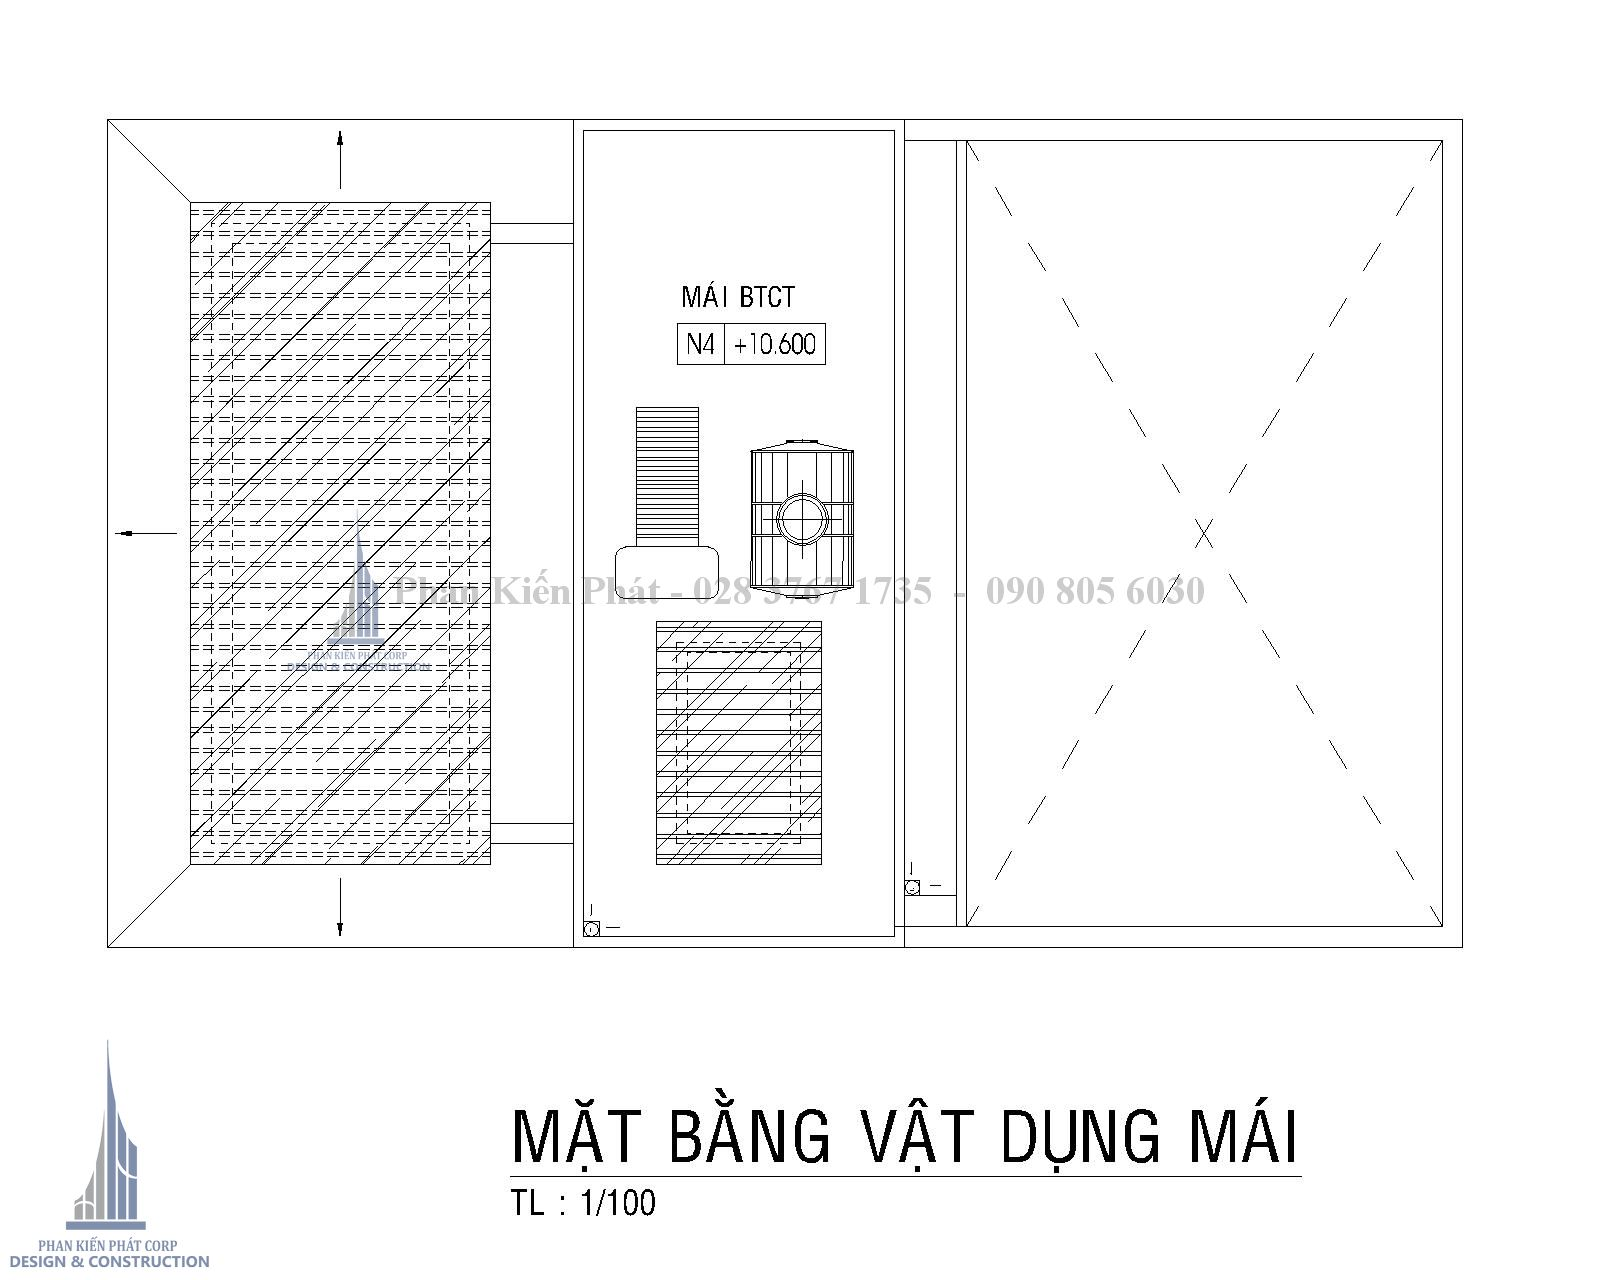 Mat Bang Mai Biet Thu Pho Hien Dai Binh Phuoc Tkxn